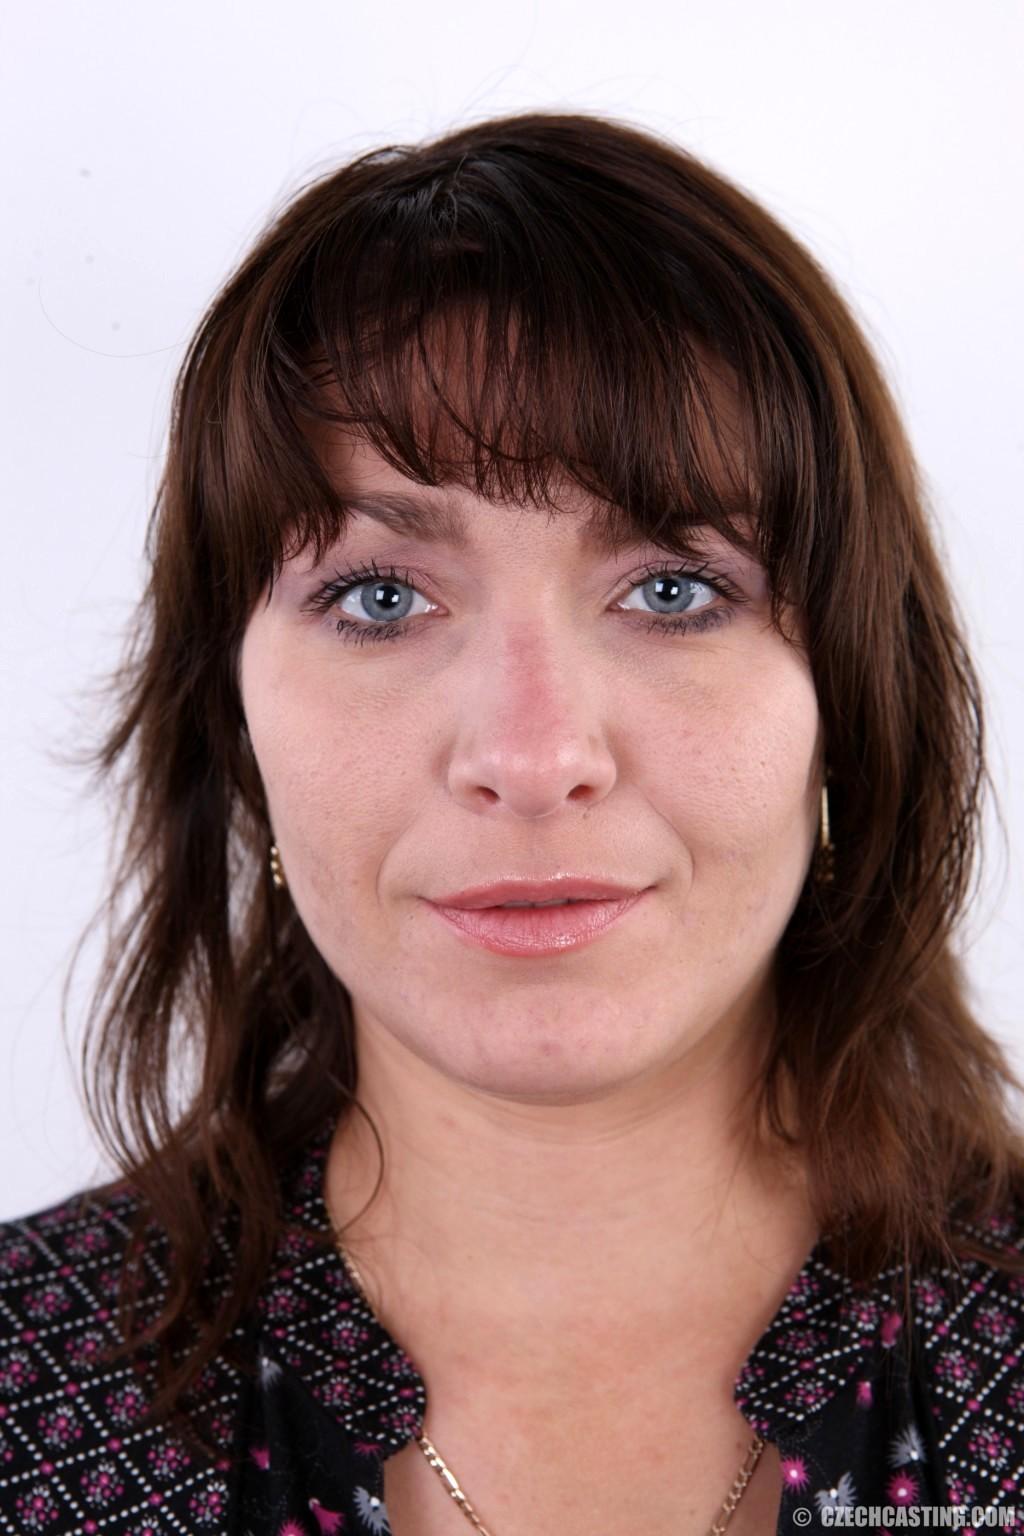 Czech Casting Czechcasting Model Mainstream Housewives